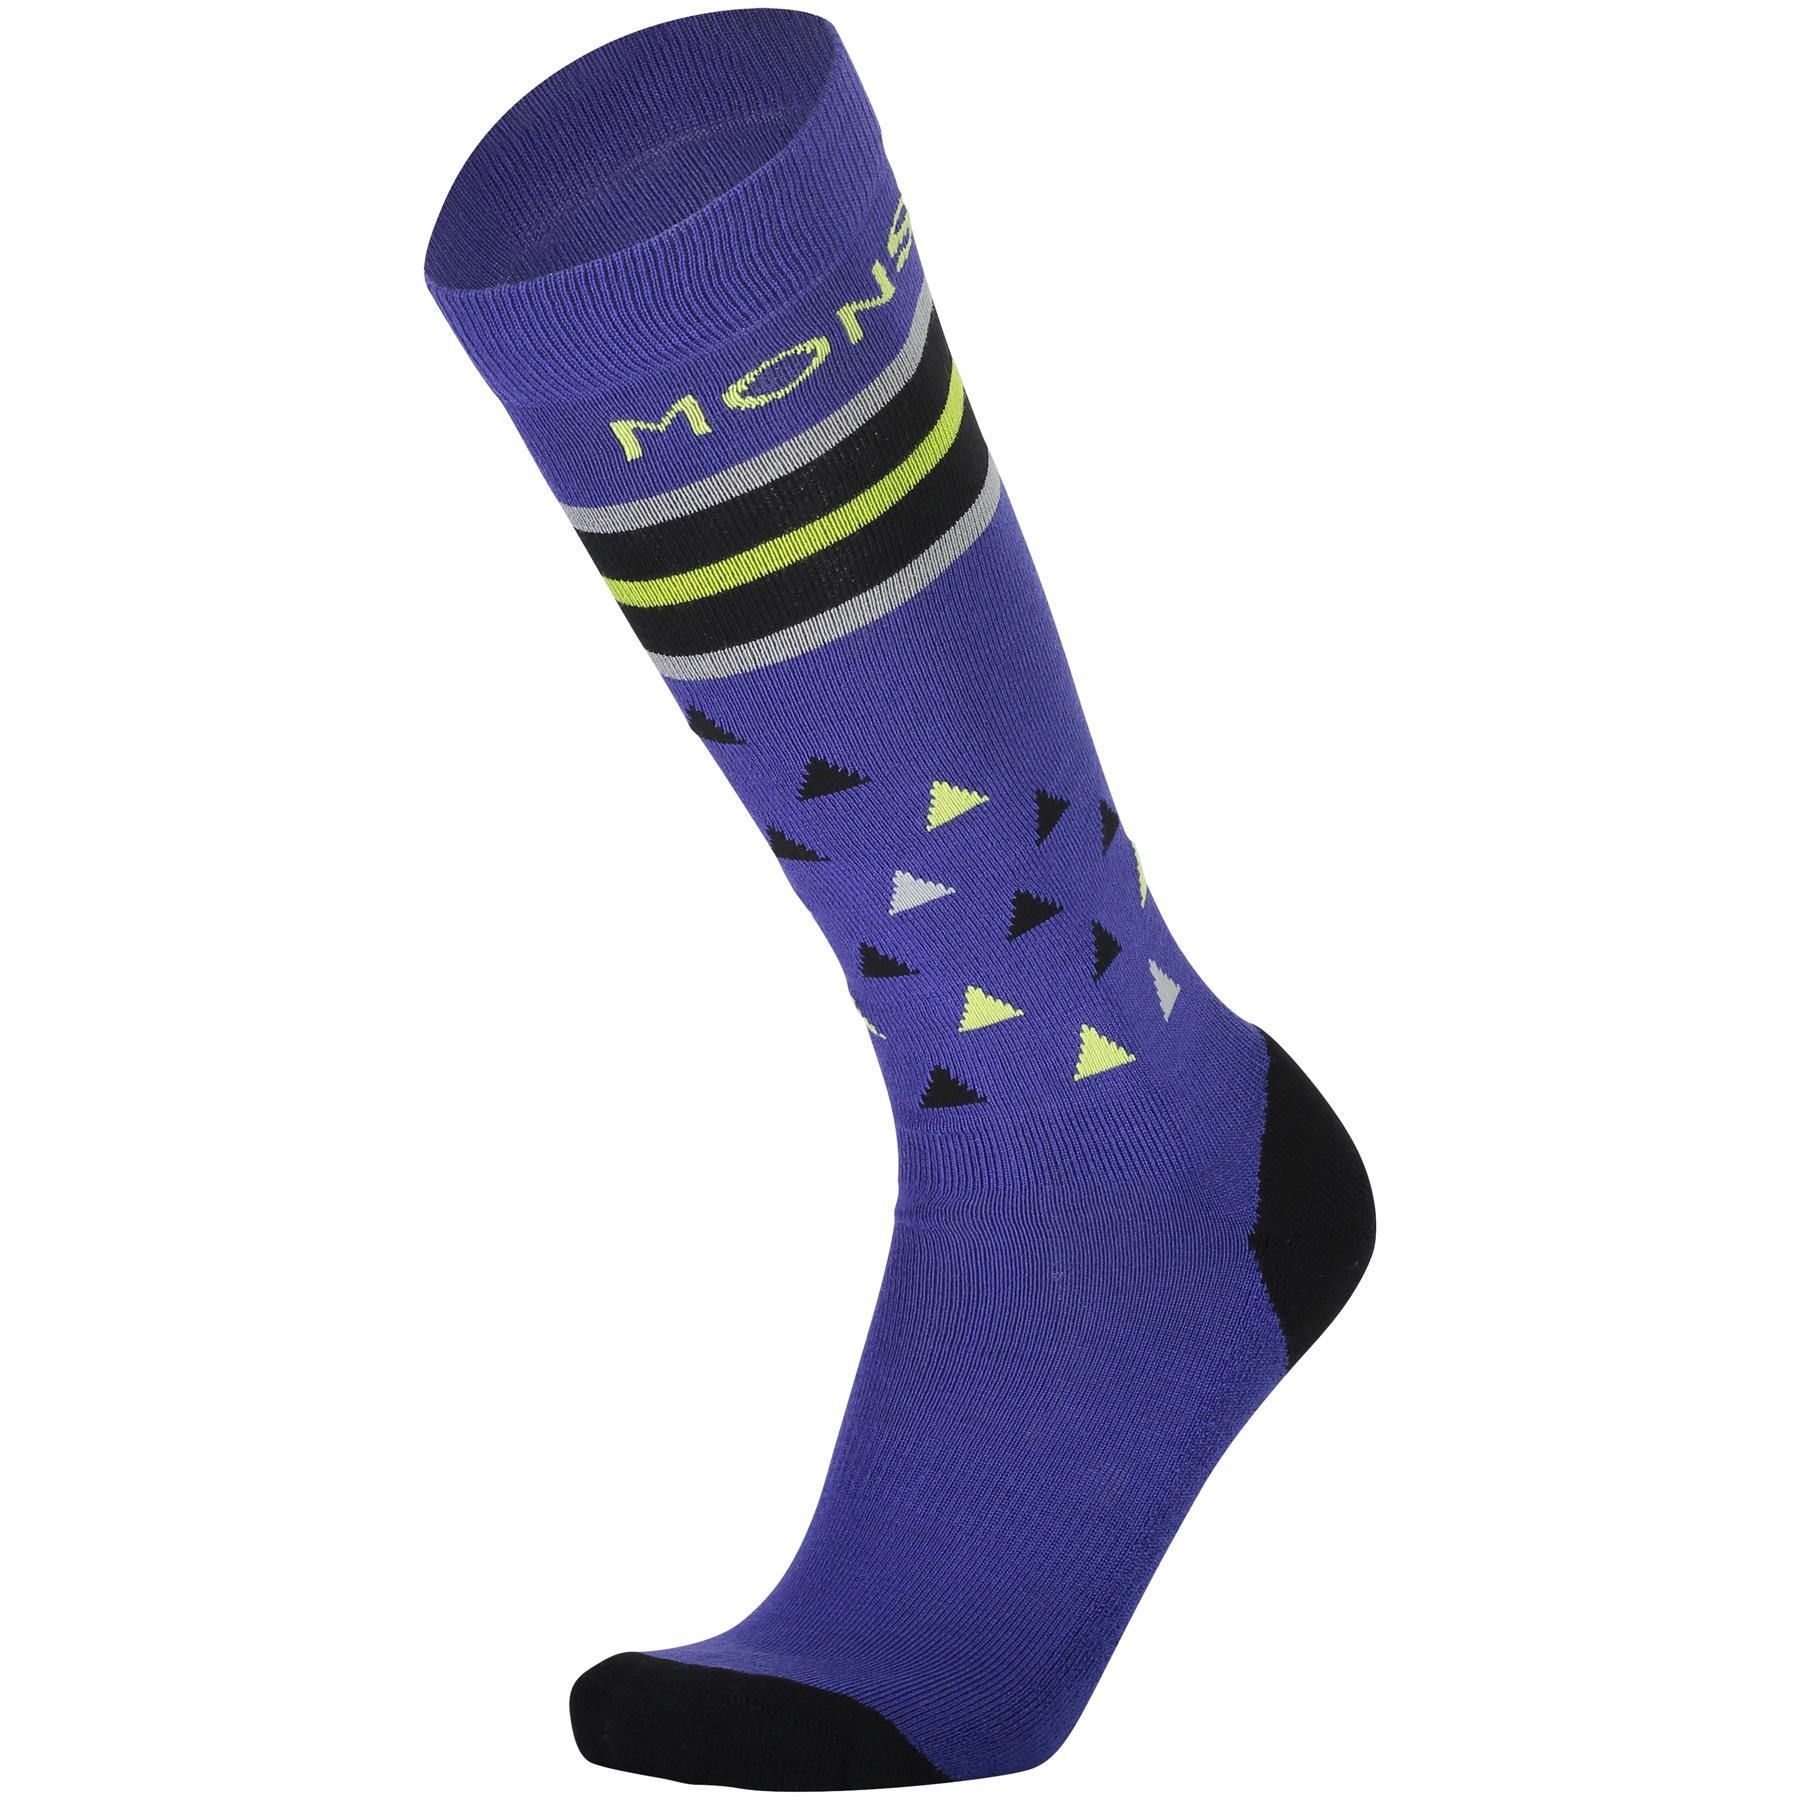 Mons Royale Lift Access Socks 100127 - ultra blue/black